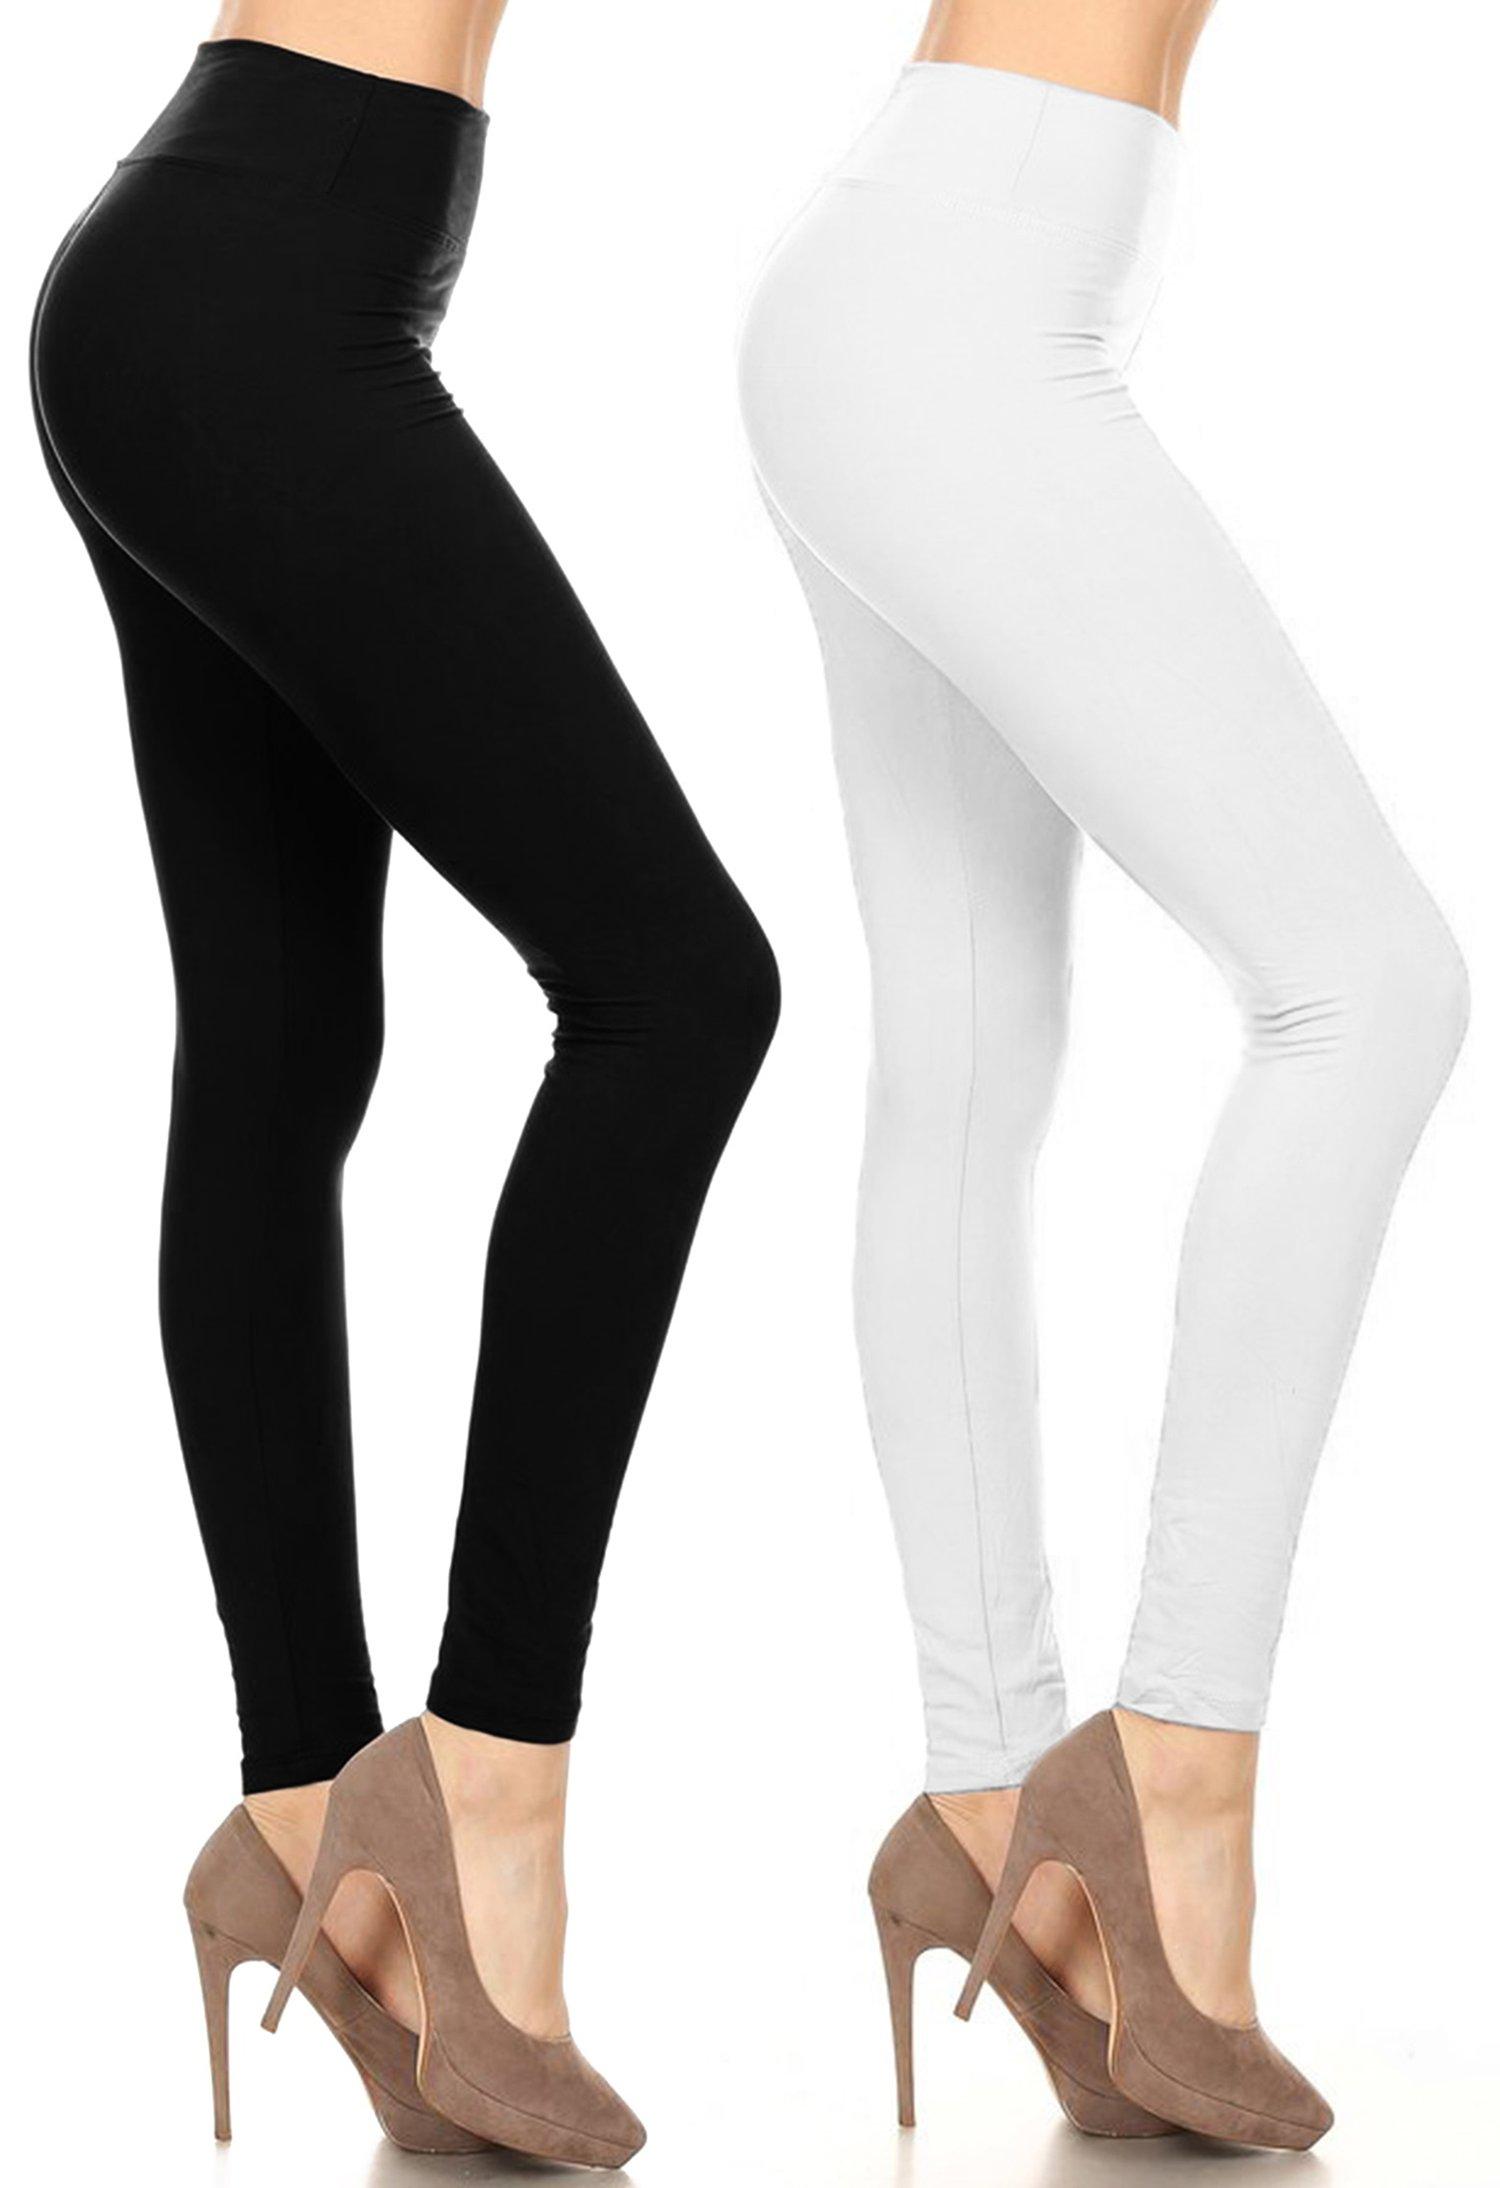 Leggings Mania Women's 2-PK Solid Leggings with Wide Yoga Waistband Black White